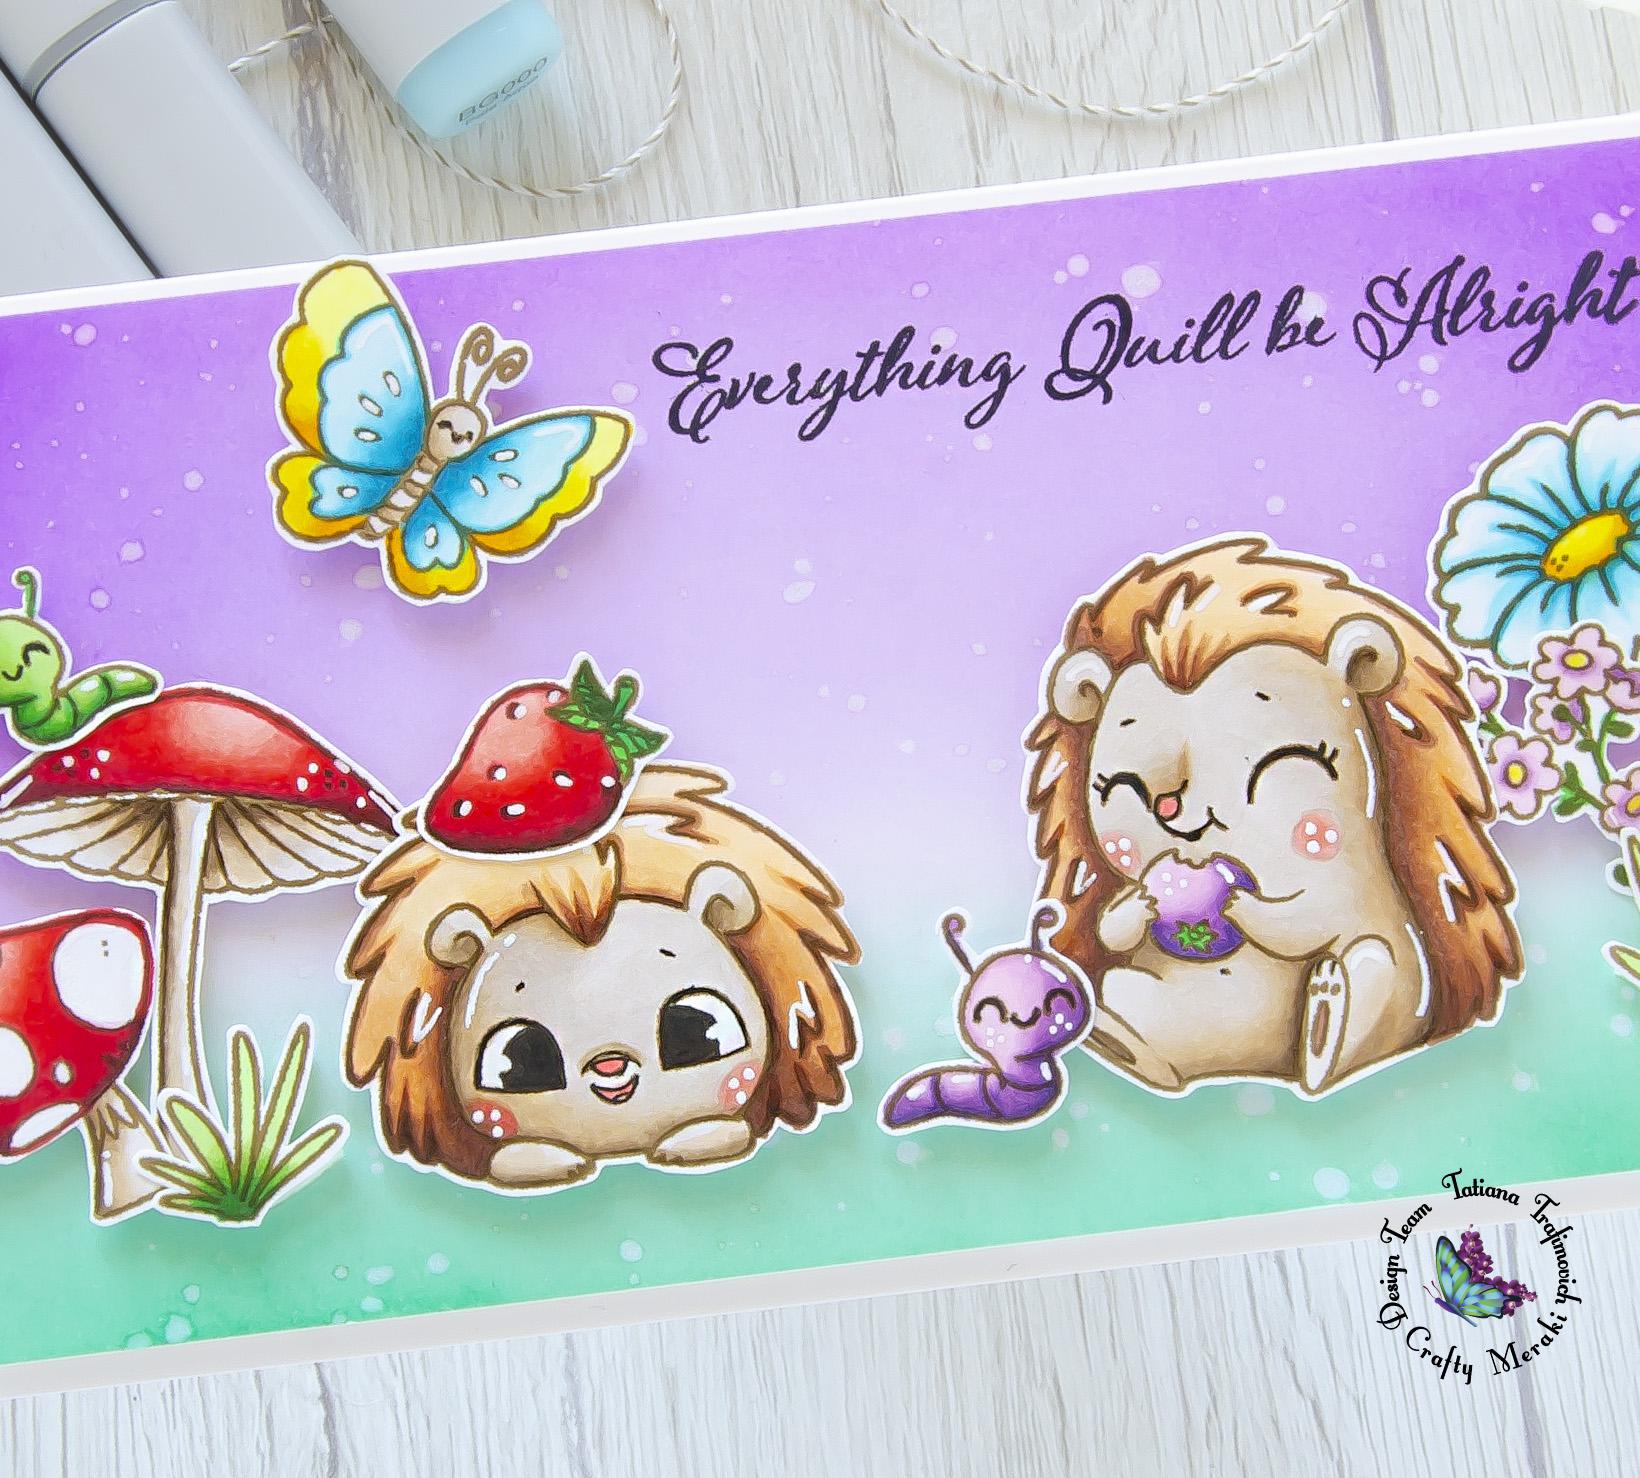 Everything Quill Be Alright #handmade card by Tatiana Trafimovich #tatianacraftandart - Just Quillin stamp set by Crafty Meraki #craftymeraki